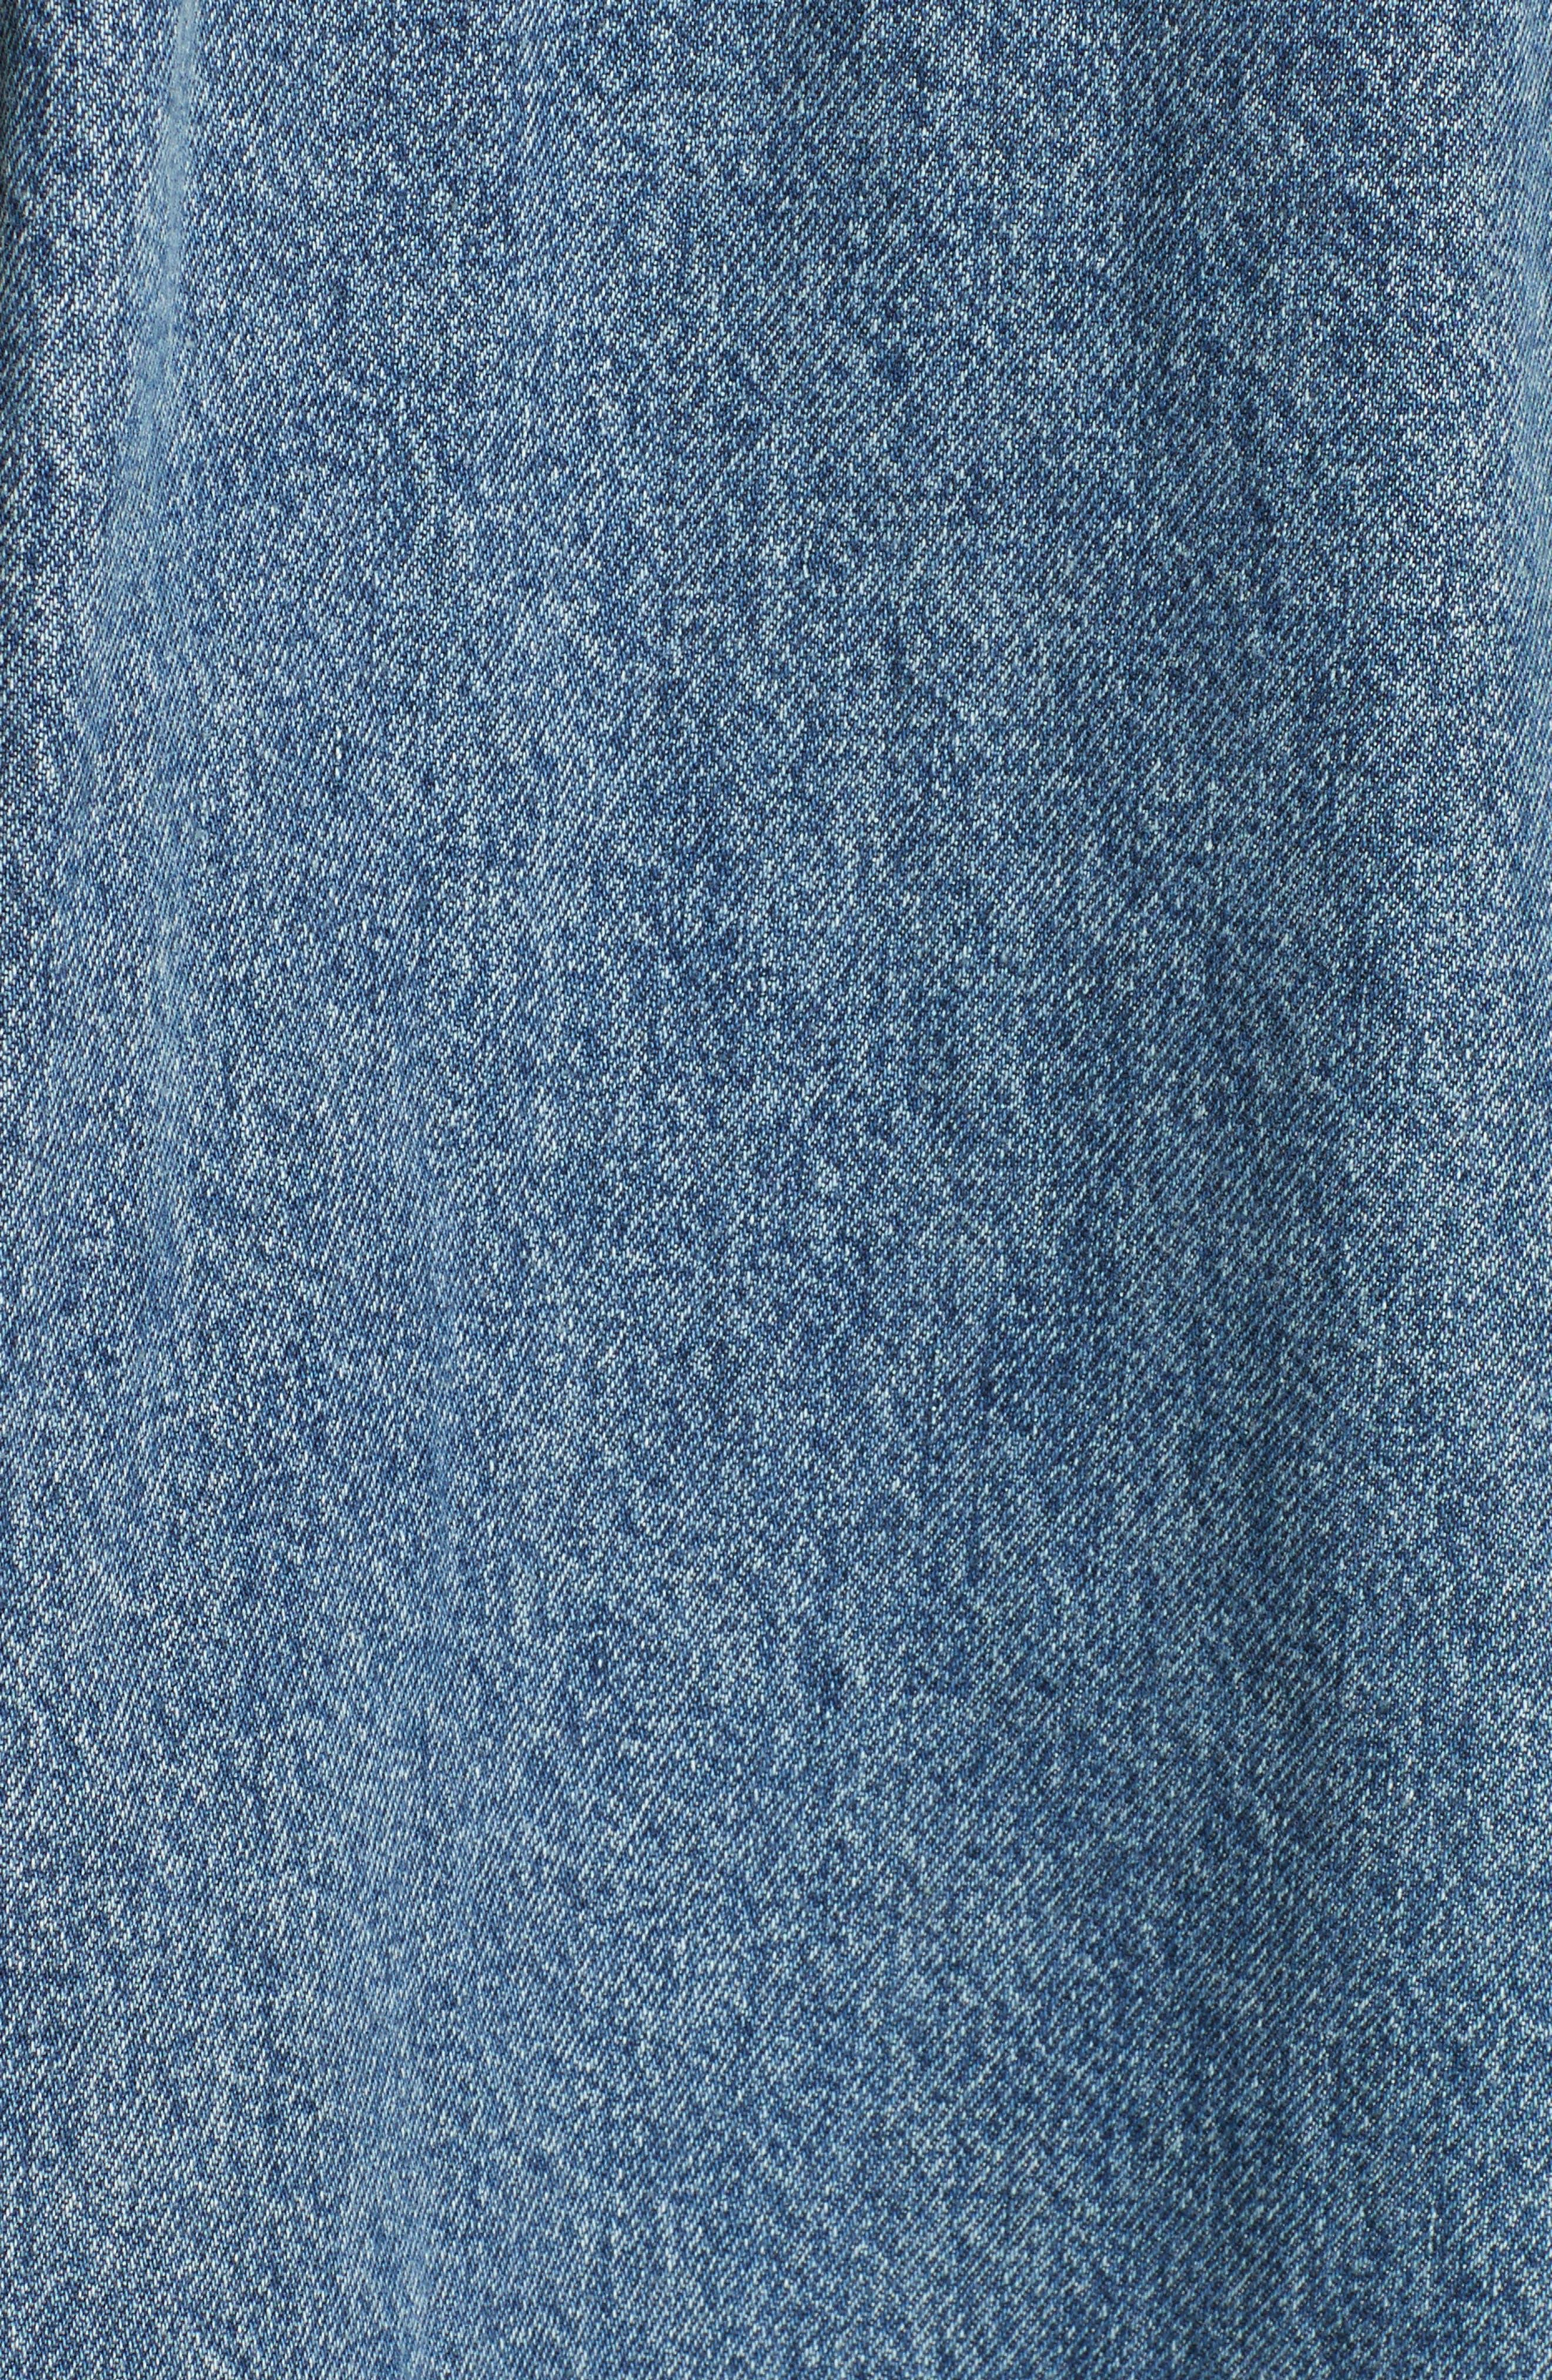 Alternate Image 3  - Vetements x Levi's® Denim Jacket